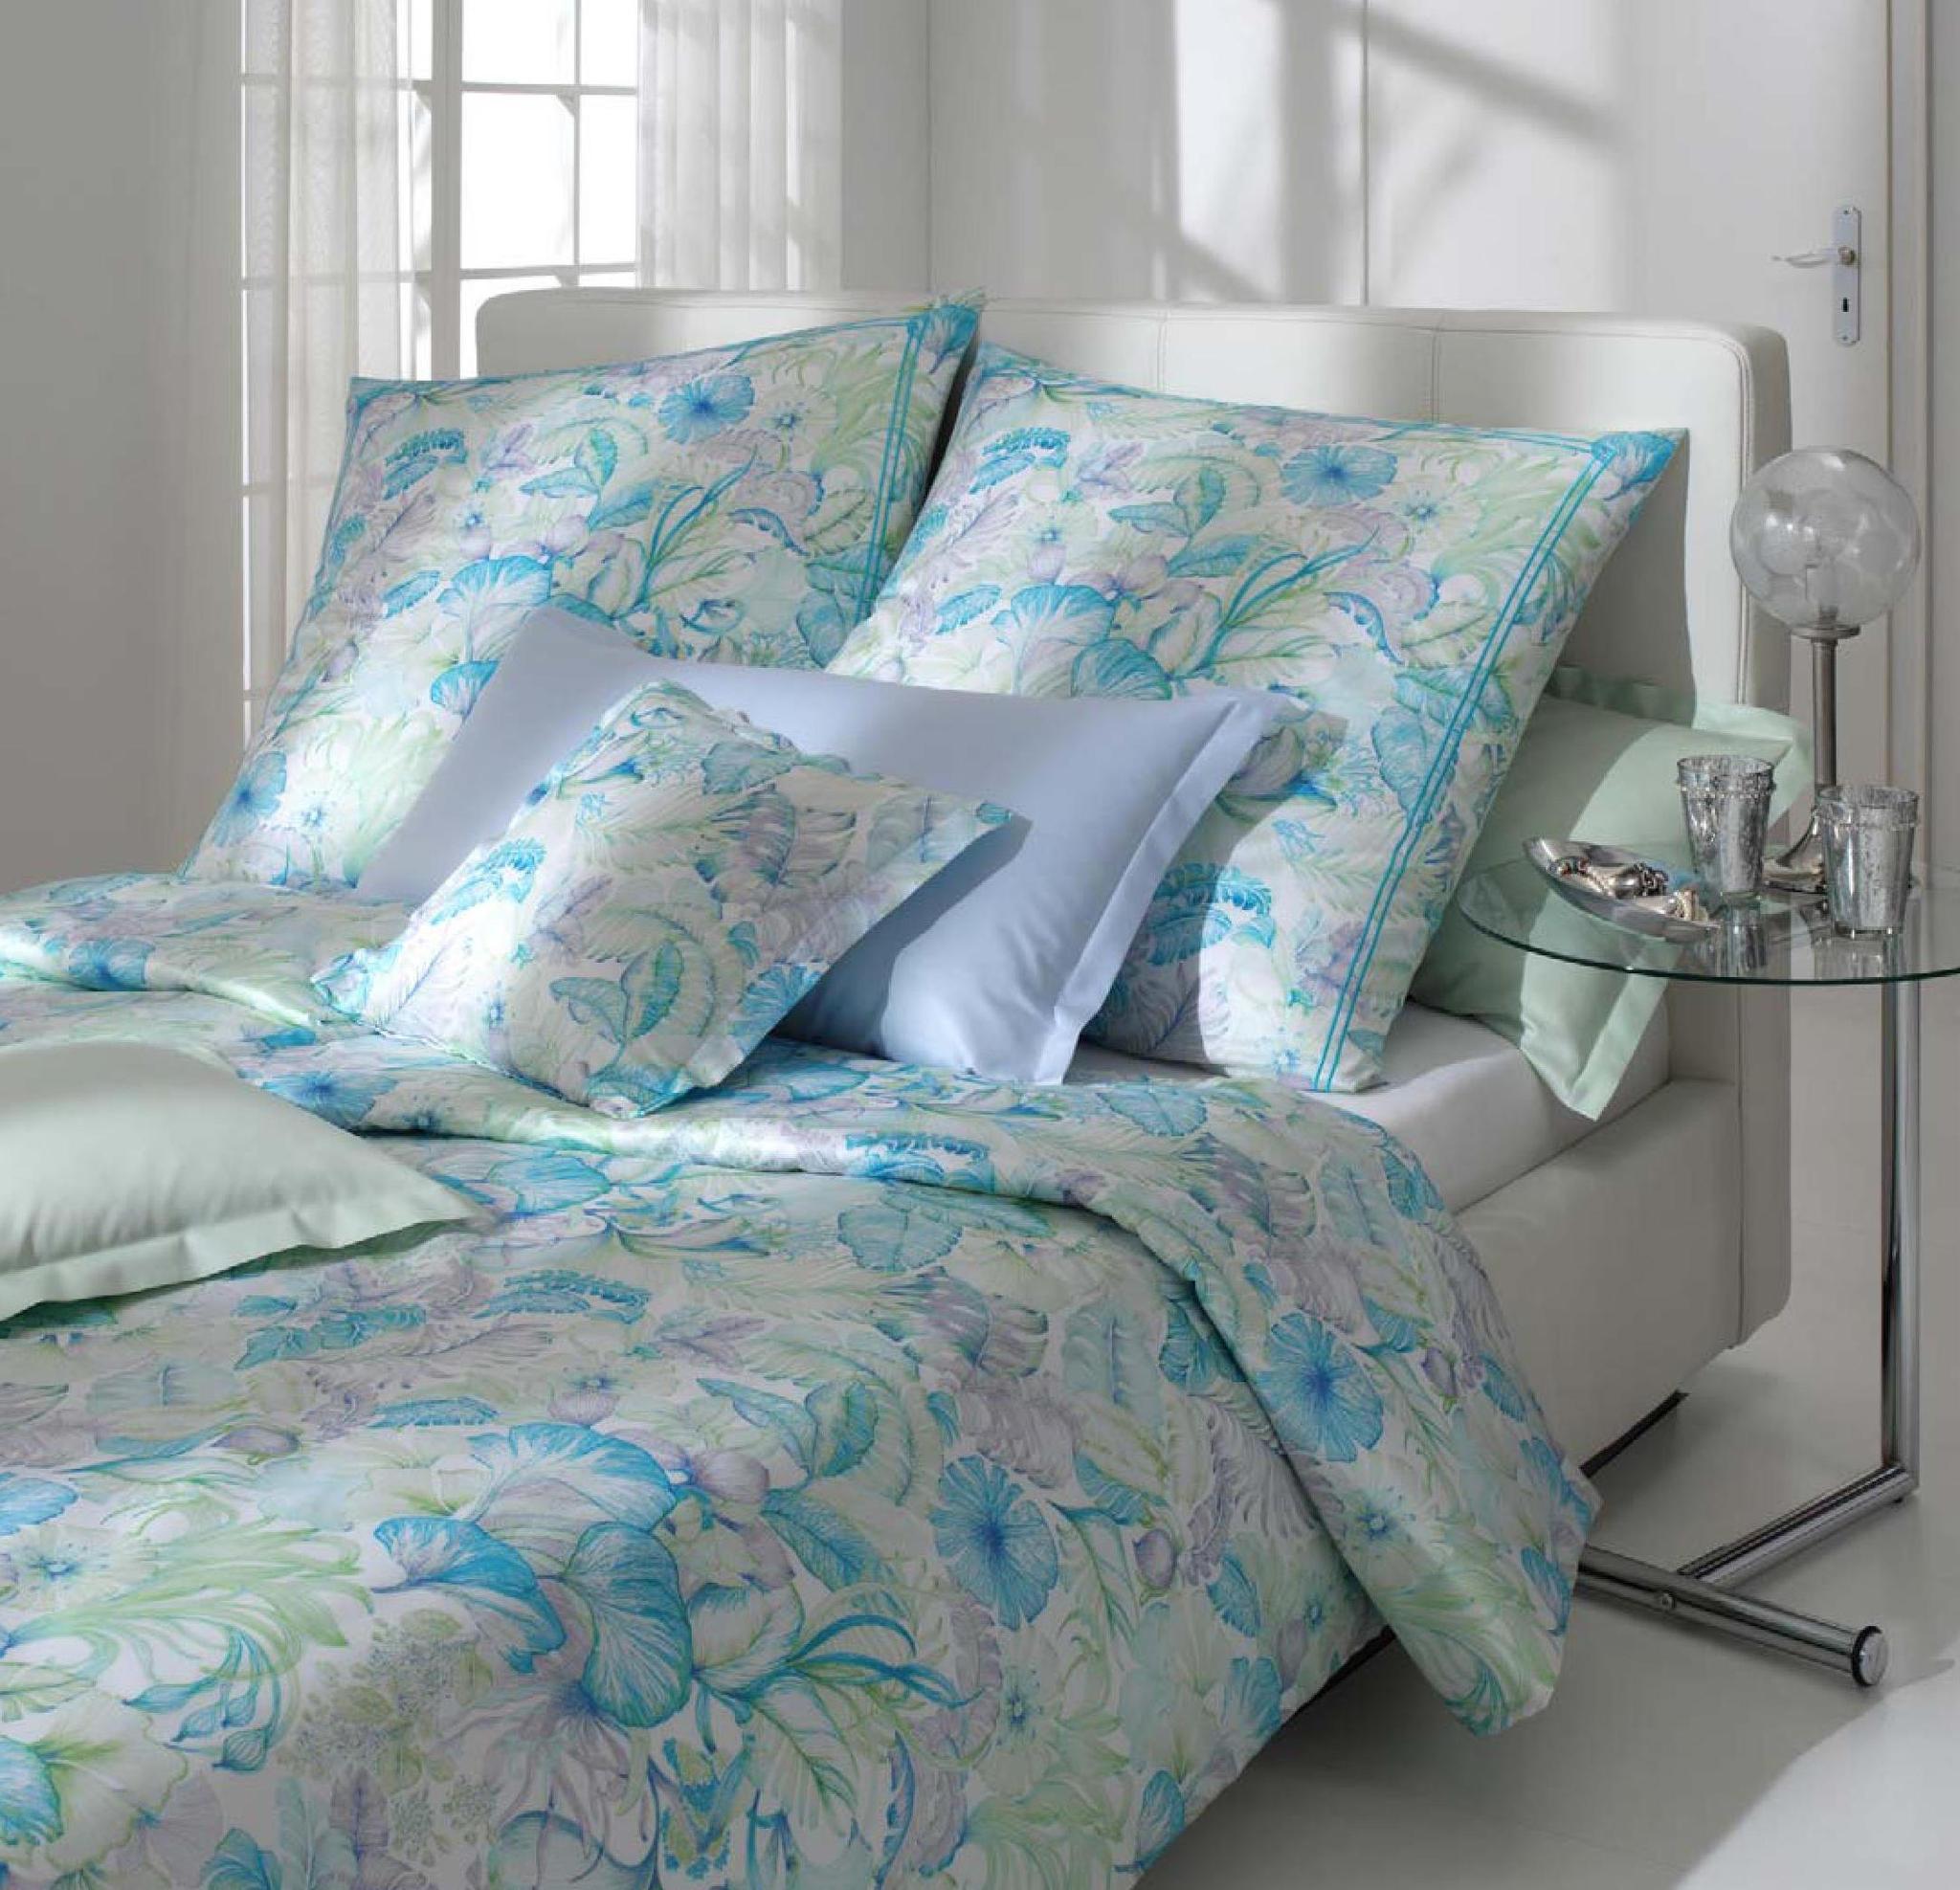 Наволочки для сна Наволочка 50x70 Elegante Antiqua синяя elitnaya-navolochka-antiqua-golubaya-ot-elegante-germaniya.jpg